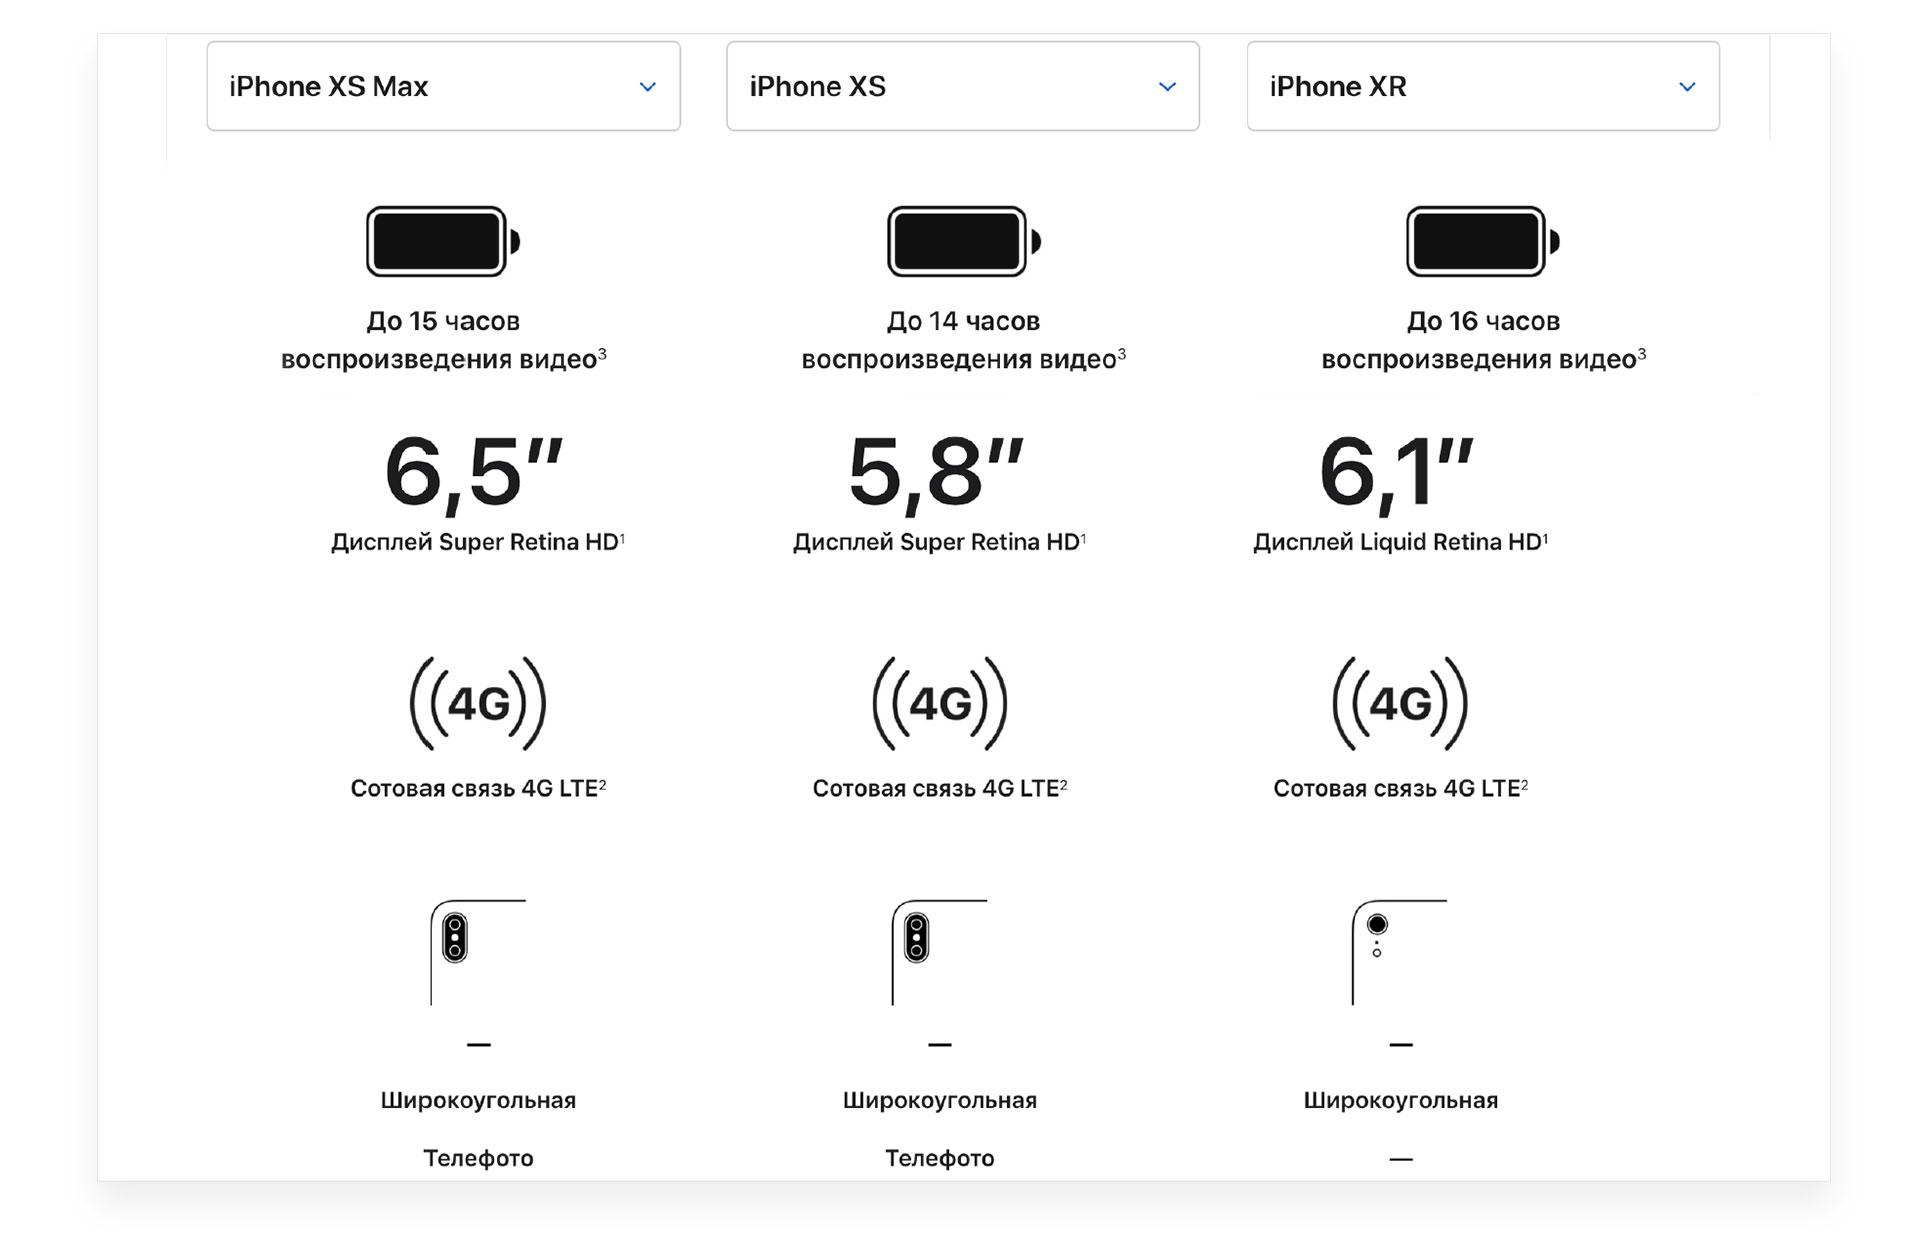 характеристики айфон xs и xr